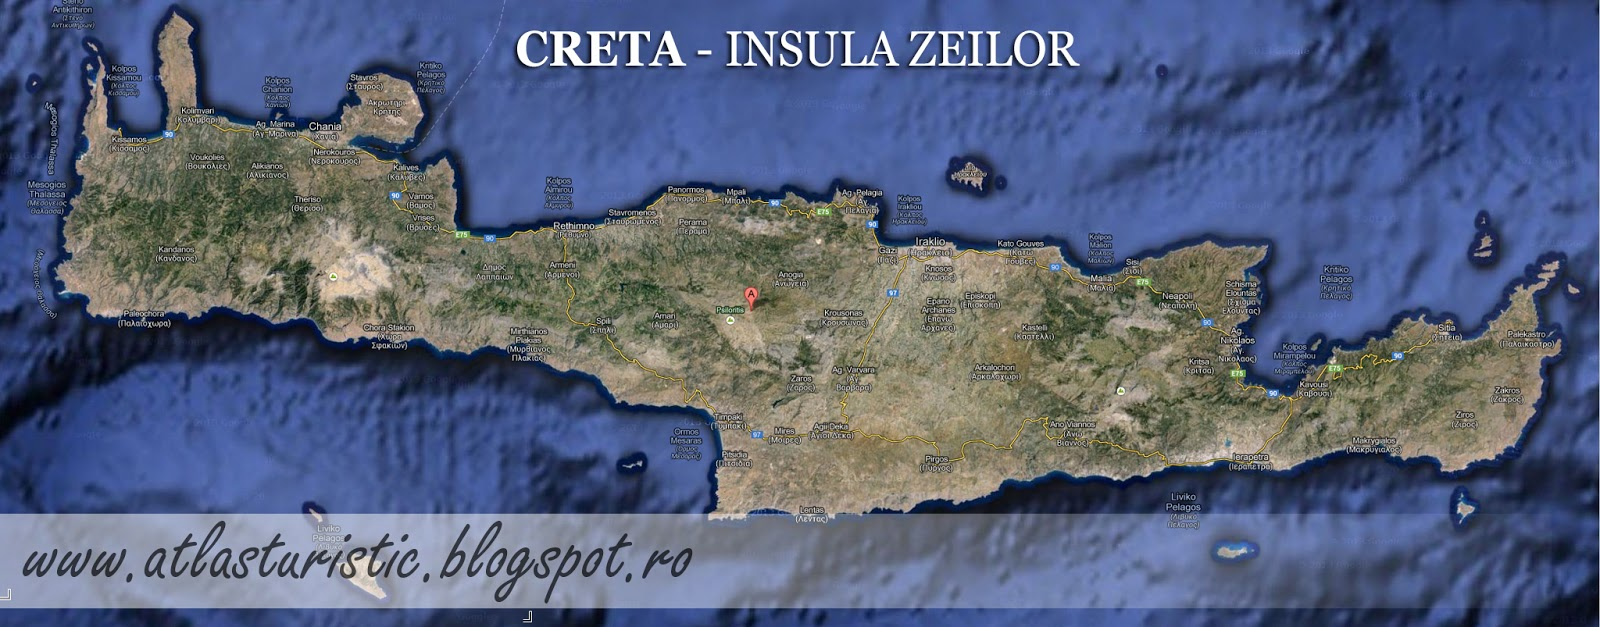 Atlas Turistic Creta Insula Zeilor